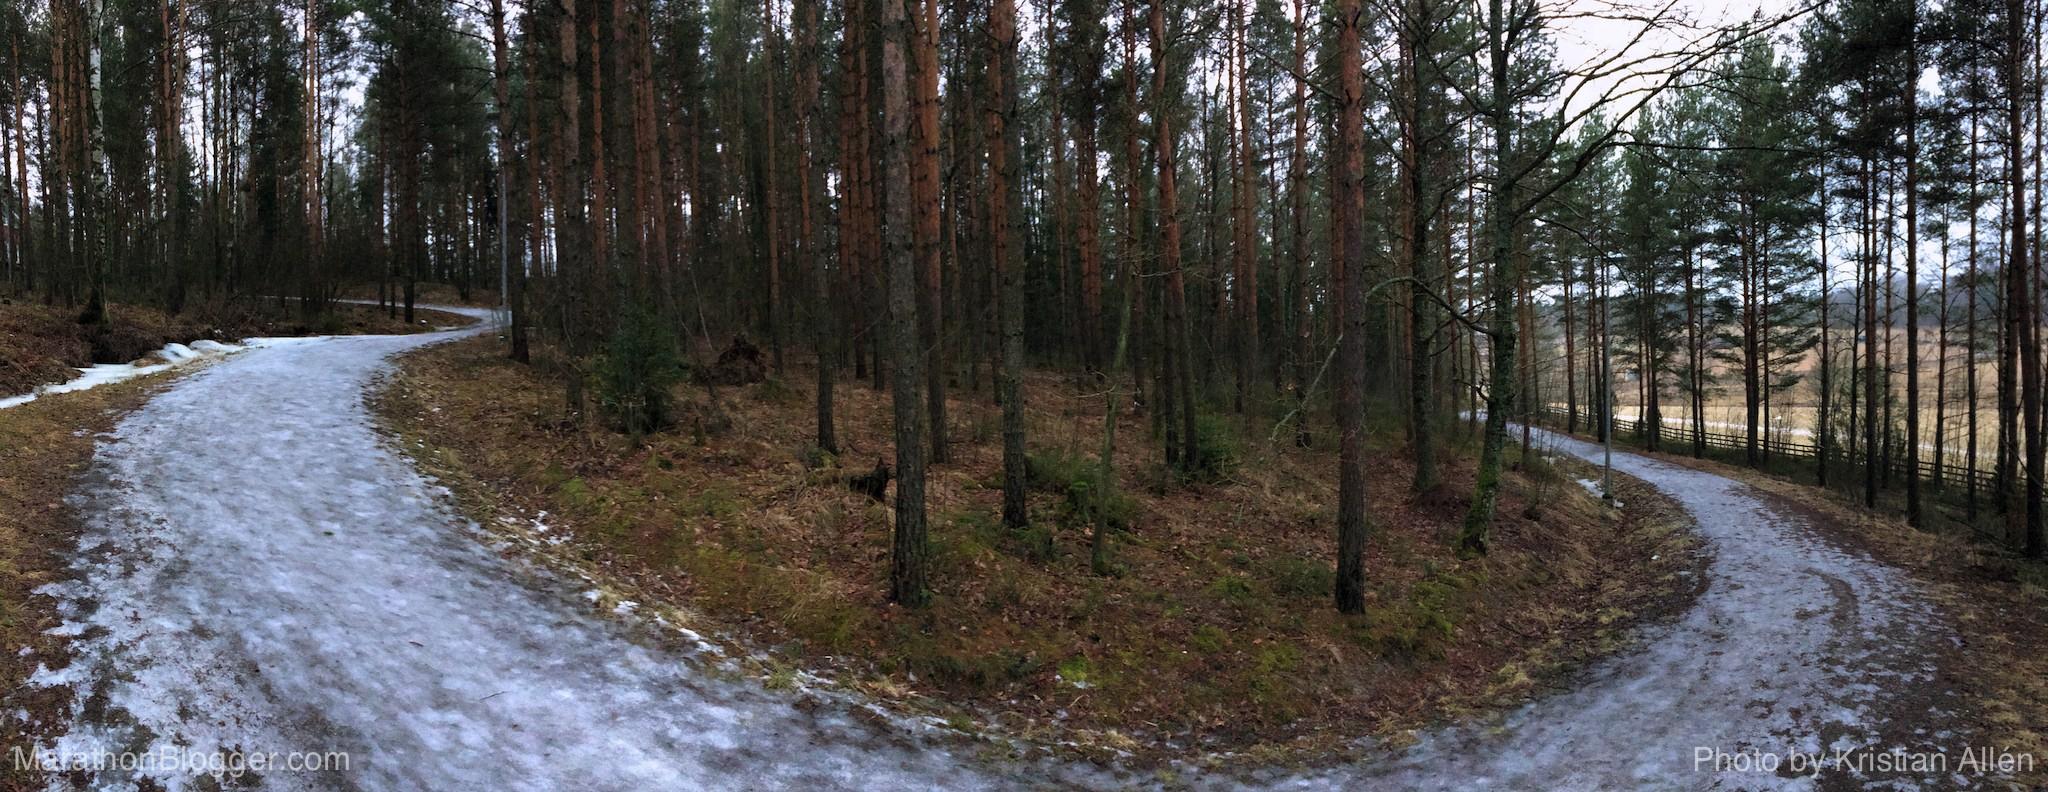 19.2.2014 17.85 km